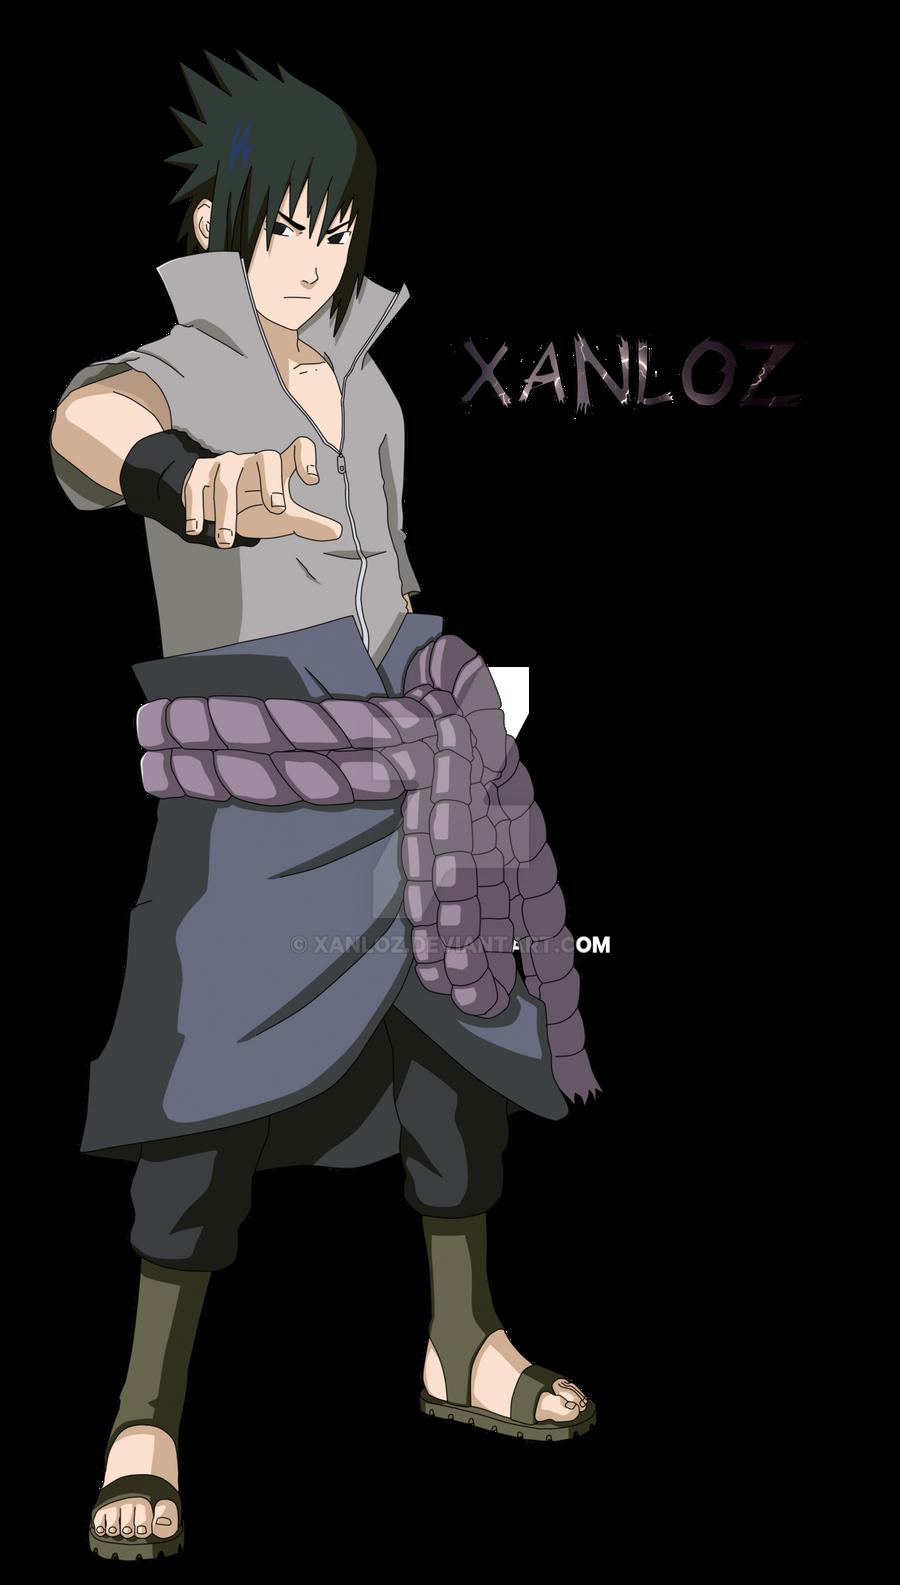 Sasuke by rOkkX on DeviantArt  |Sasuke Kirin Render